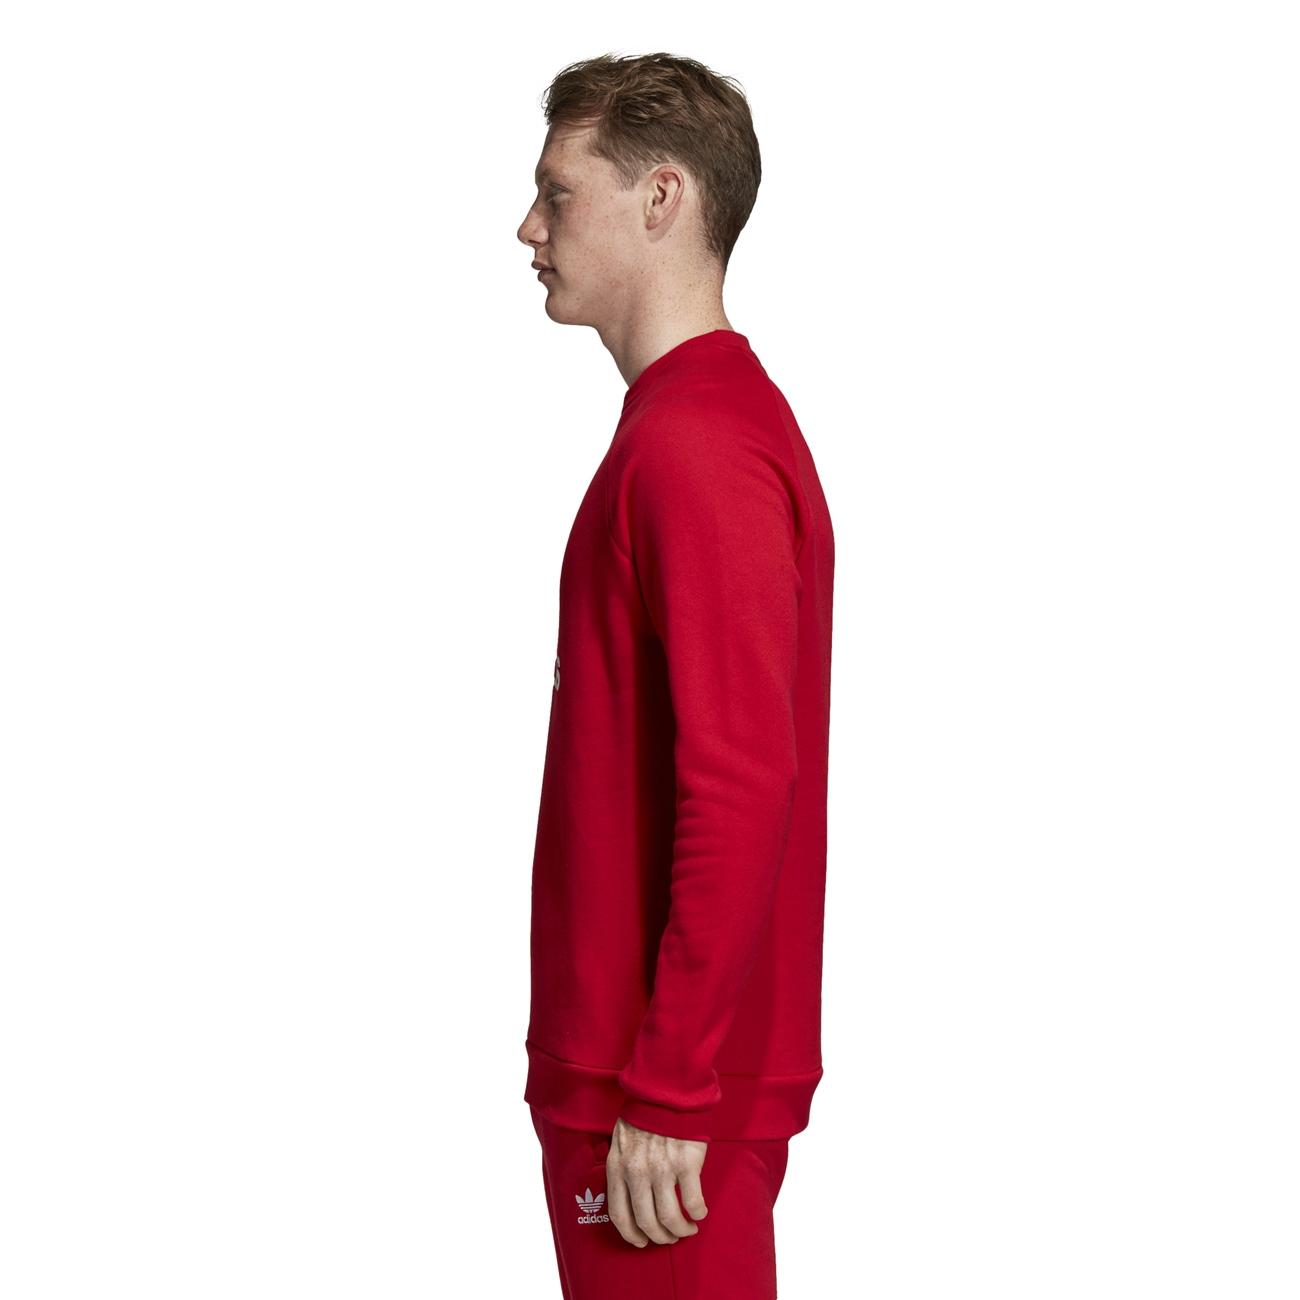 ADIDAS Trefoil Felpe Uomo Power rosso Uomo Pullover Rosso Rosso Rosso Bianco ee0608